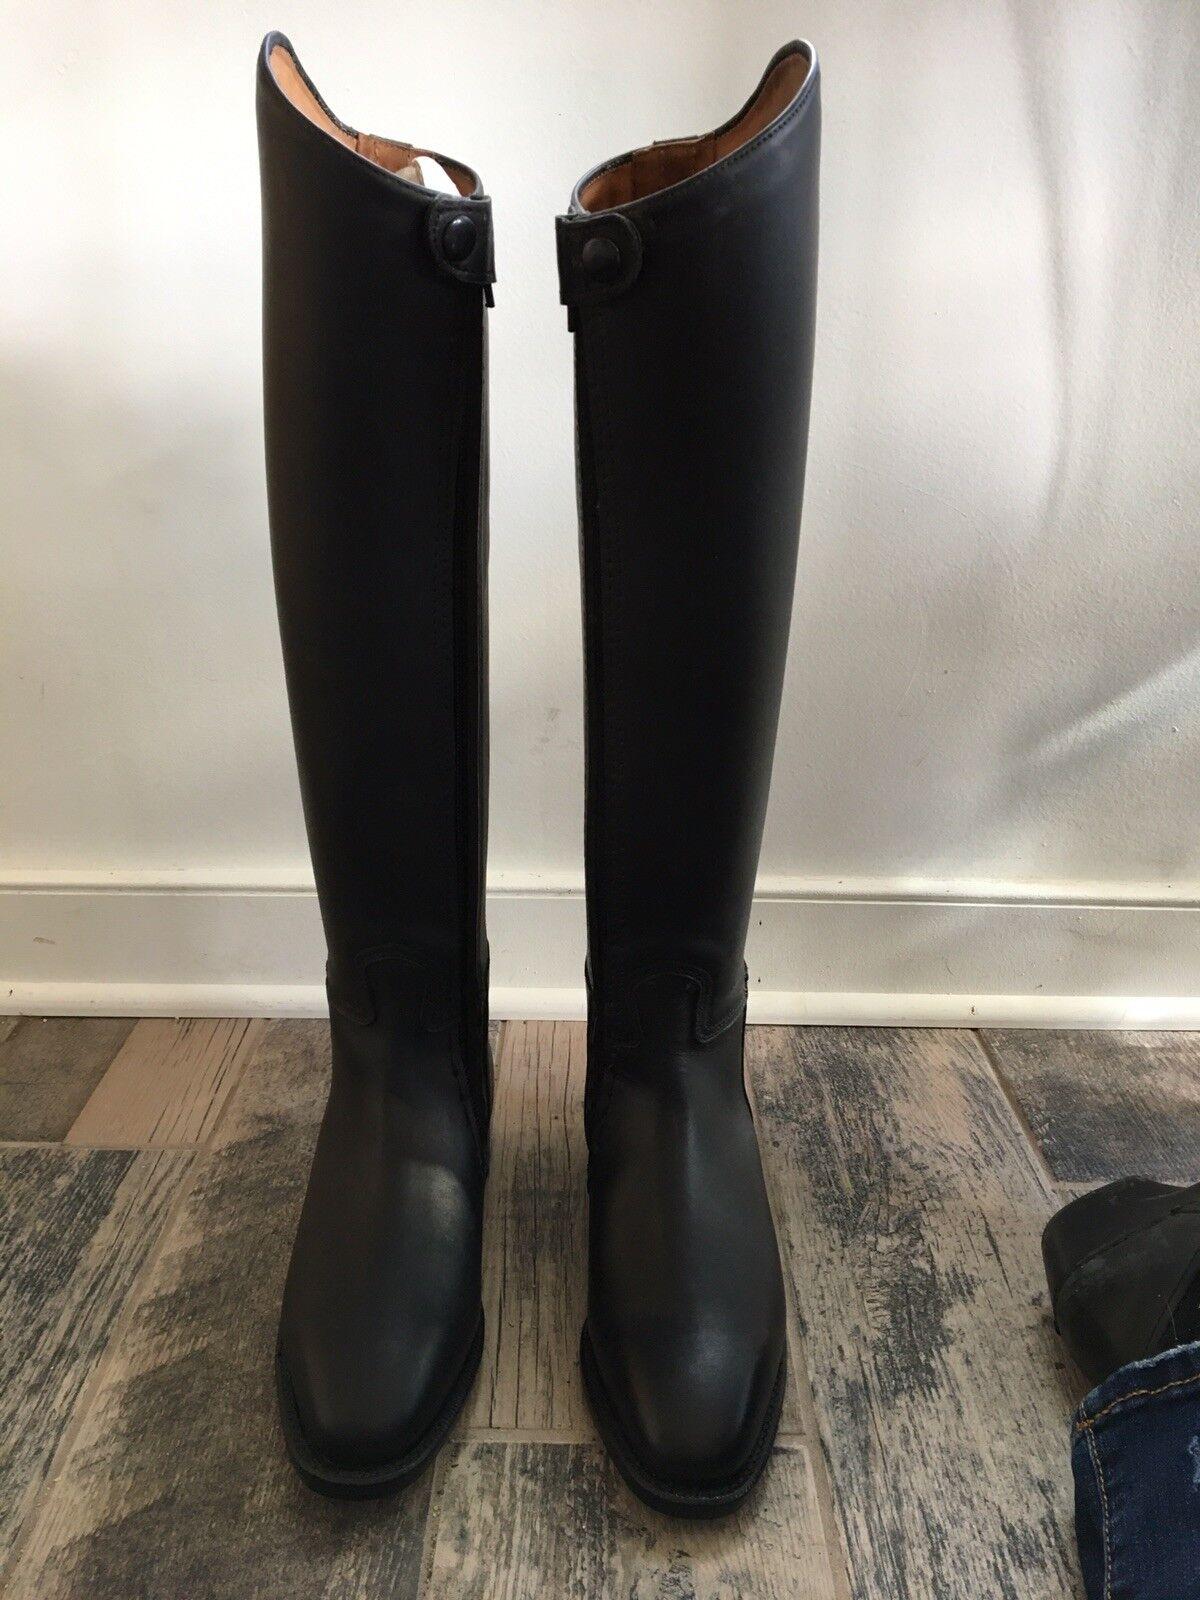 New Womans Dressage stivali W YKK Zippers Weltmeister Cavallo Dimensione US 8 XLW